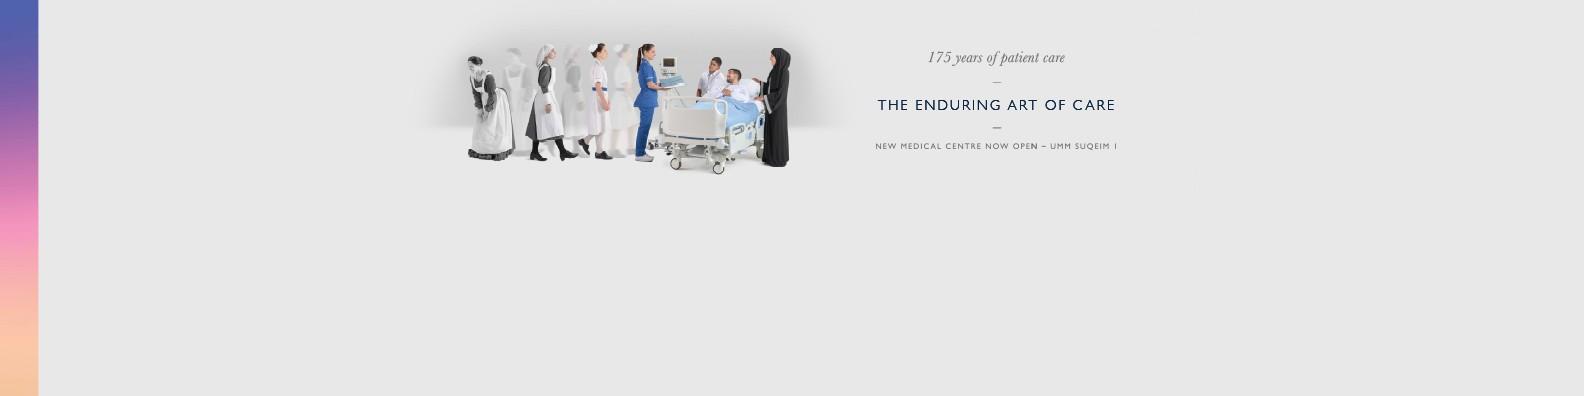 King's College Hospital London – UAE   LinkedIn